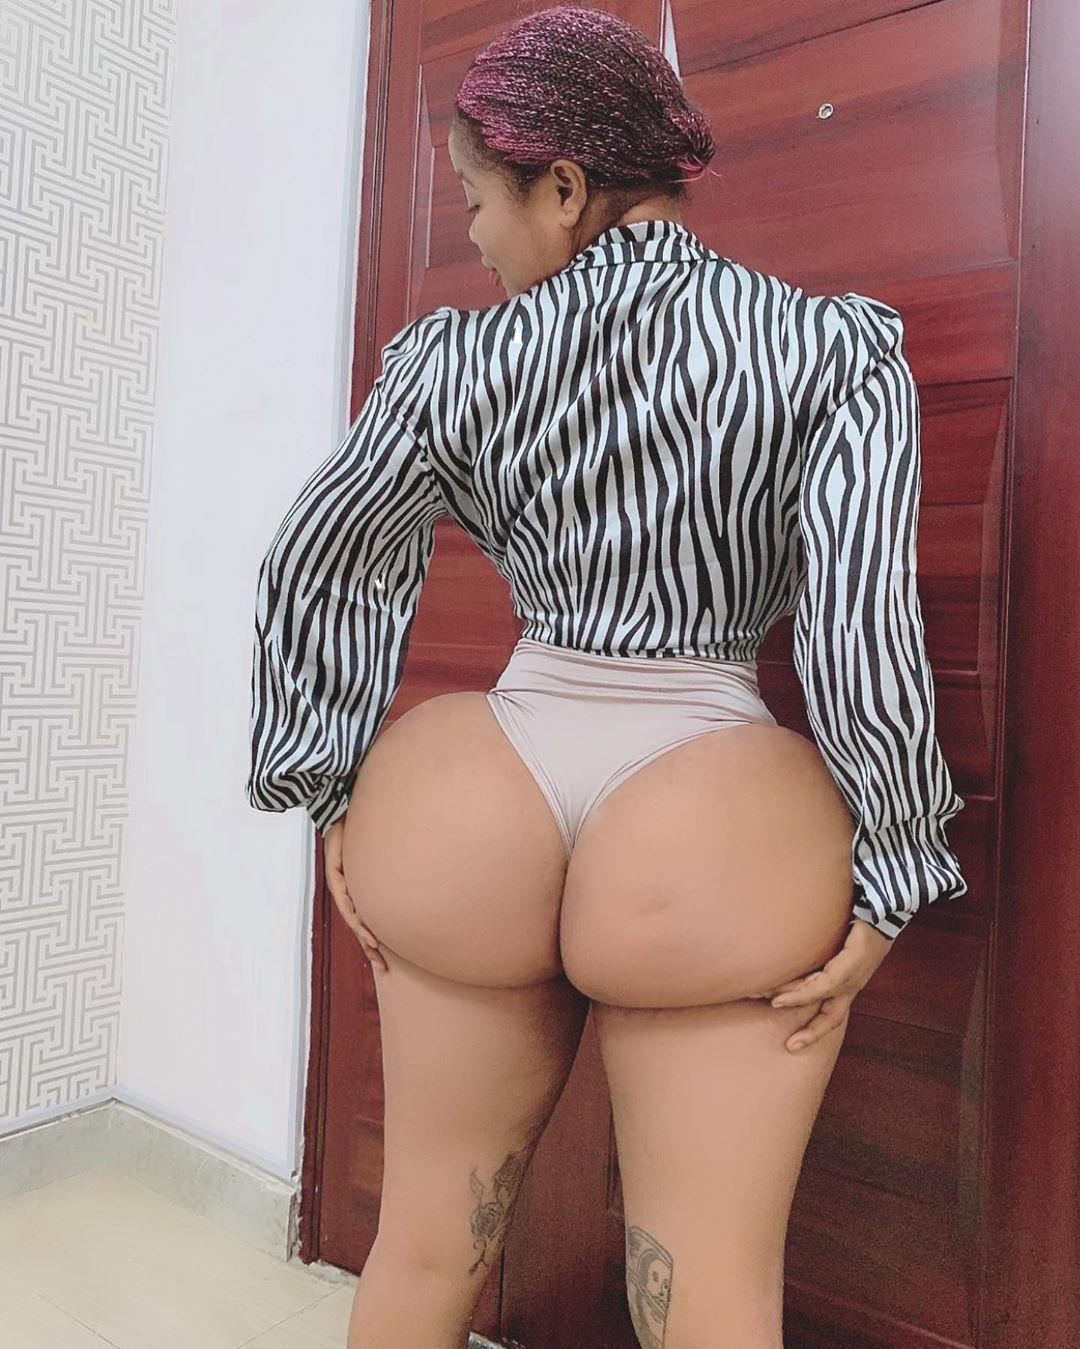 Roman Goddess flaunts massive buttocks on IG